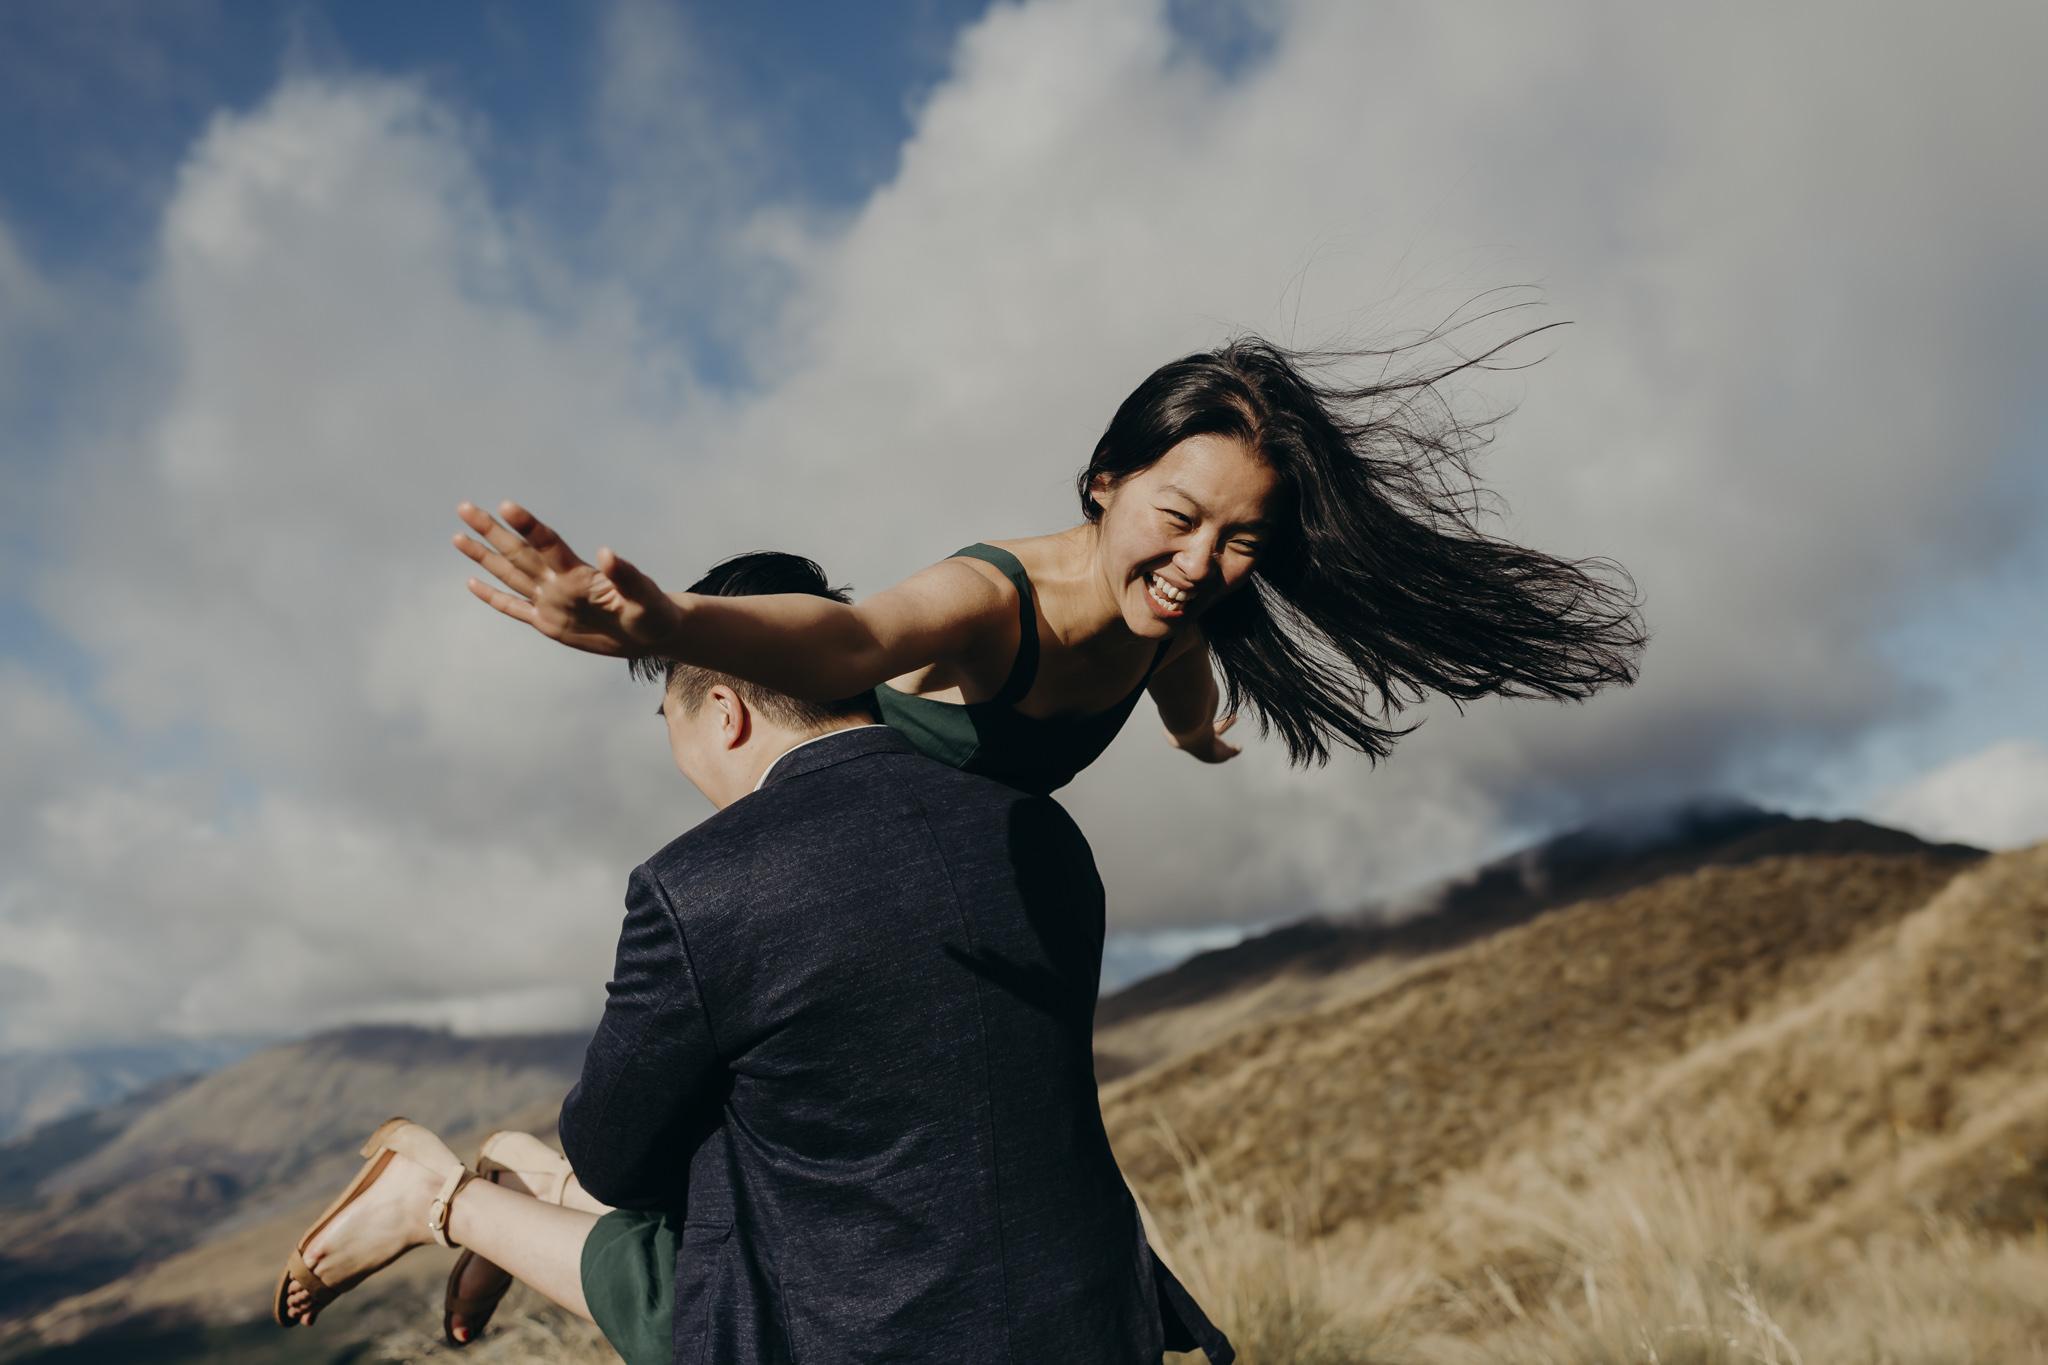 Keith & Suejing - Surprise Proposal Queenstown, New ZealandFebruary 2019